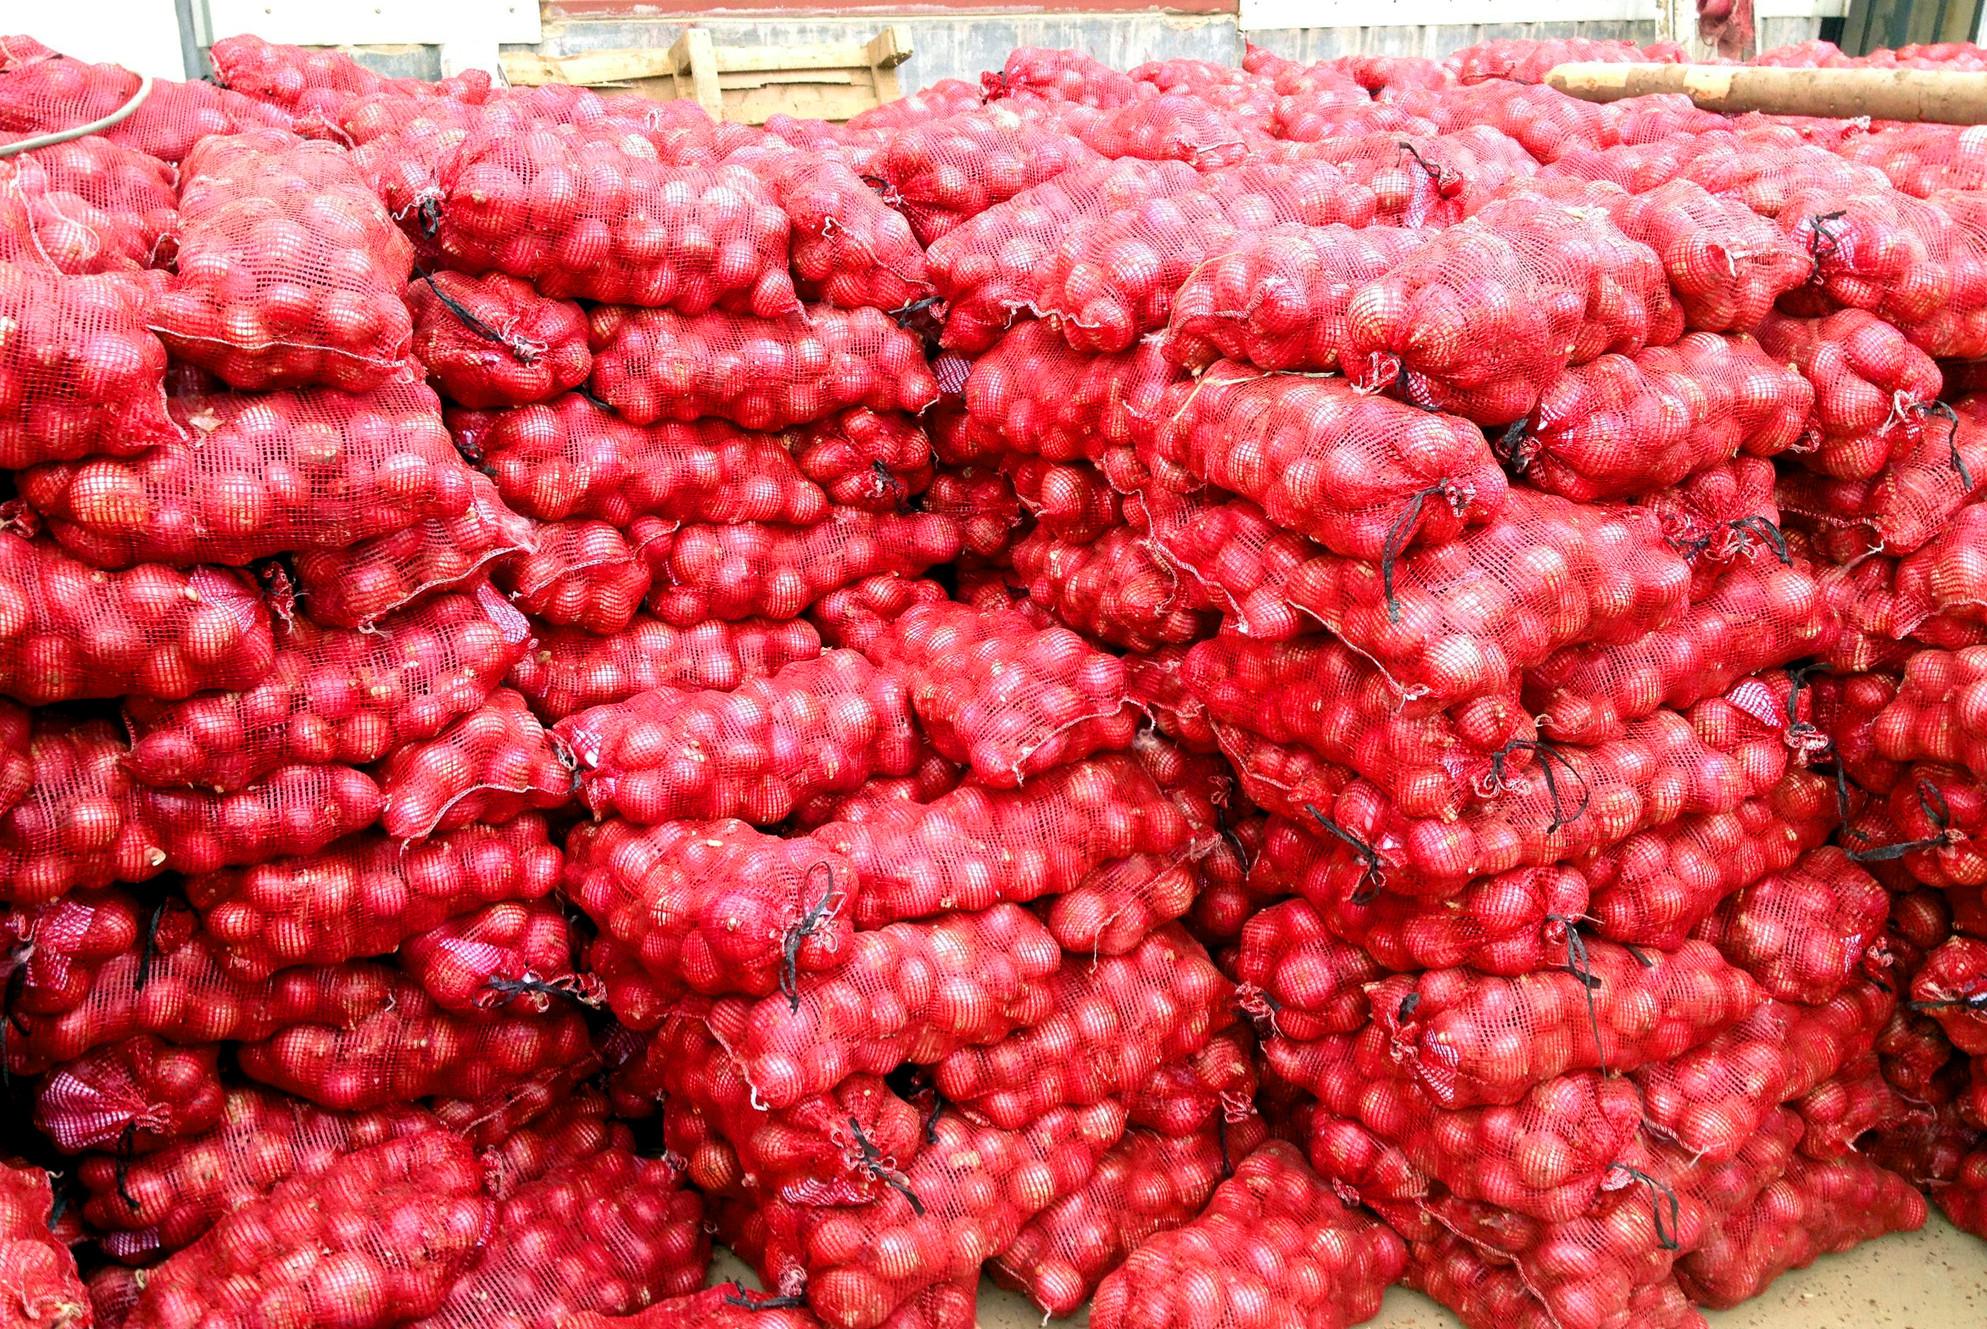 Onion and Potato Wholesaler | SC Wholesale